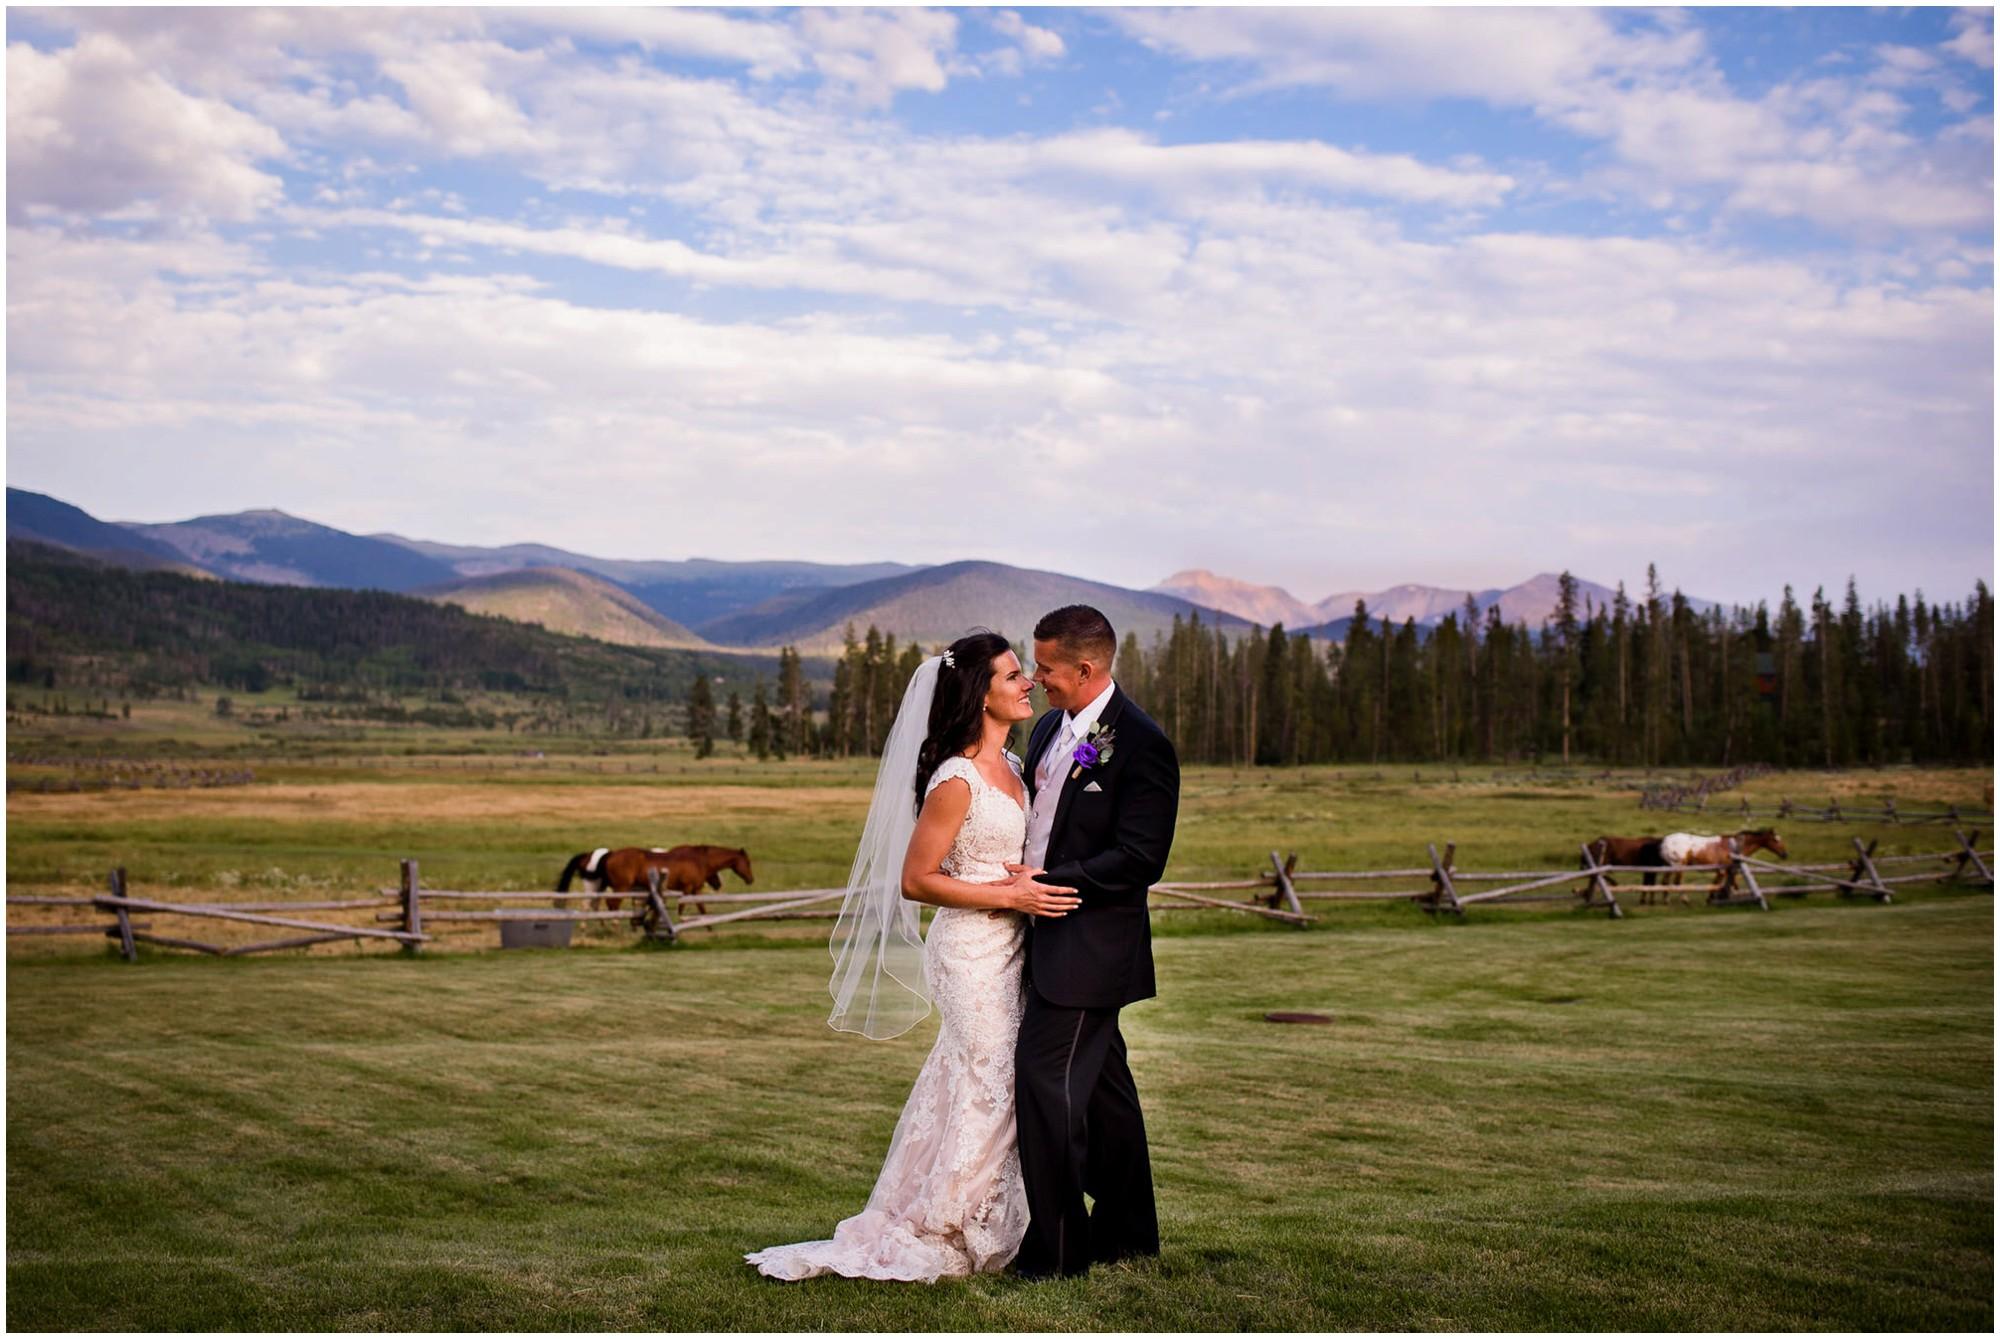 149-Devils-thumb-ranch-tabernash-wedding-v2.jpg